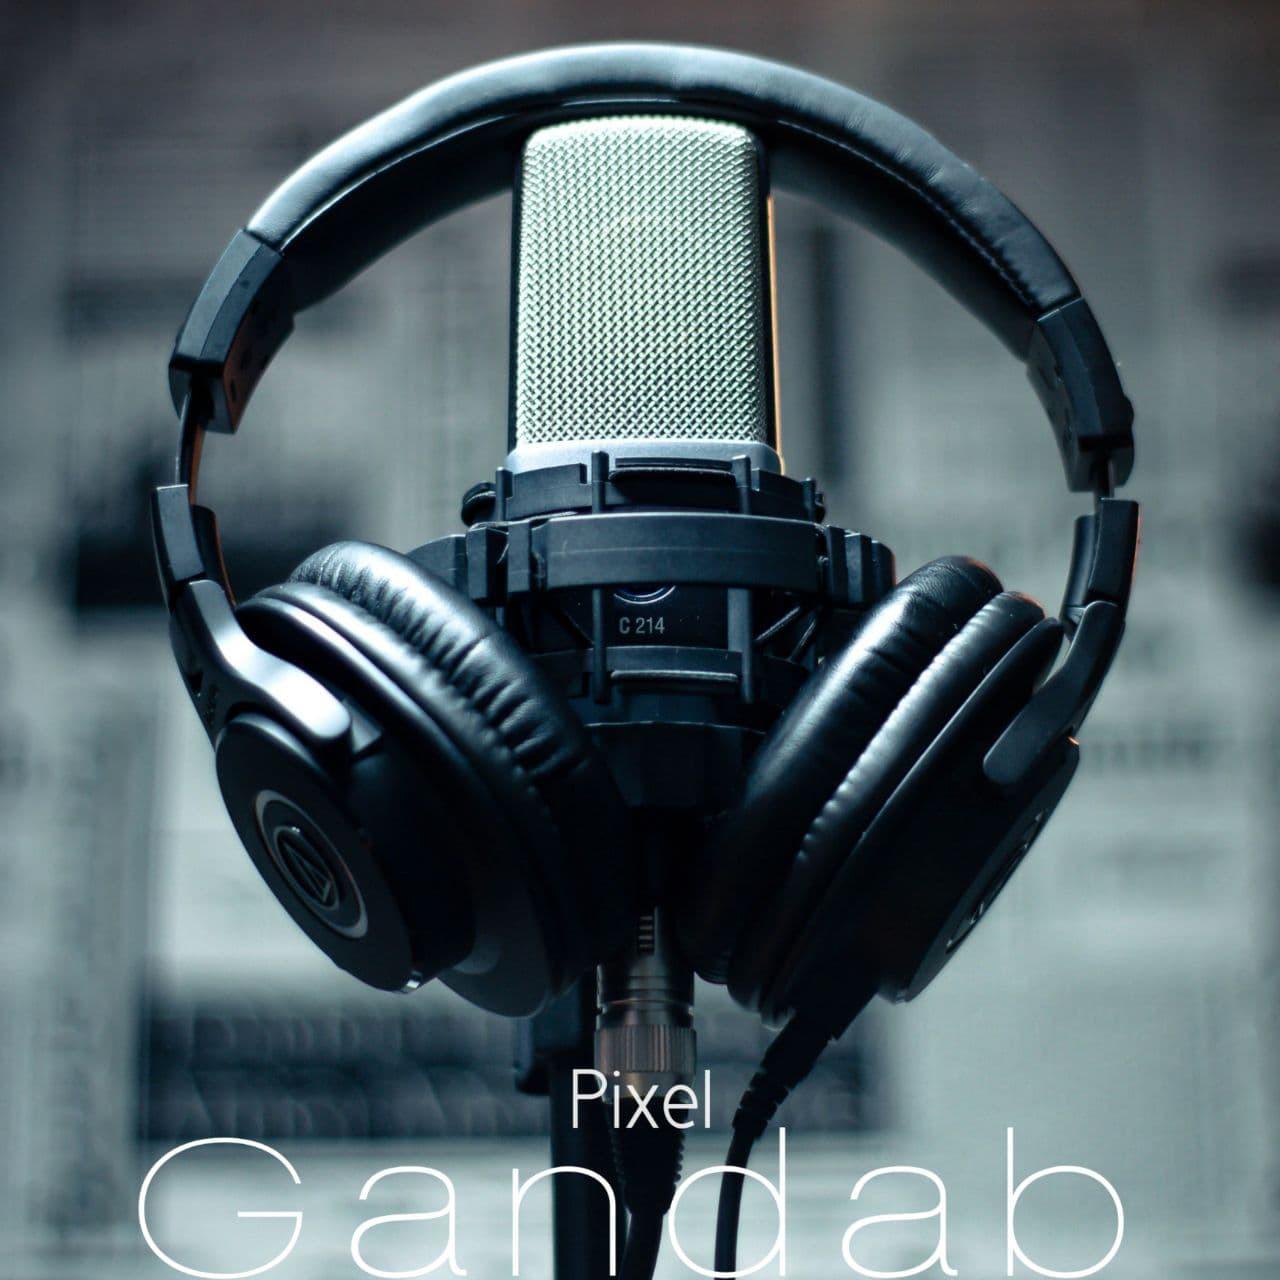 Pixel - Gandab